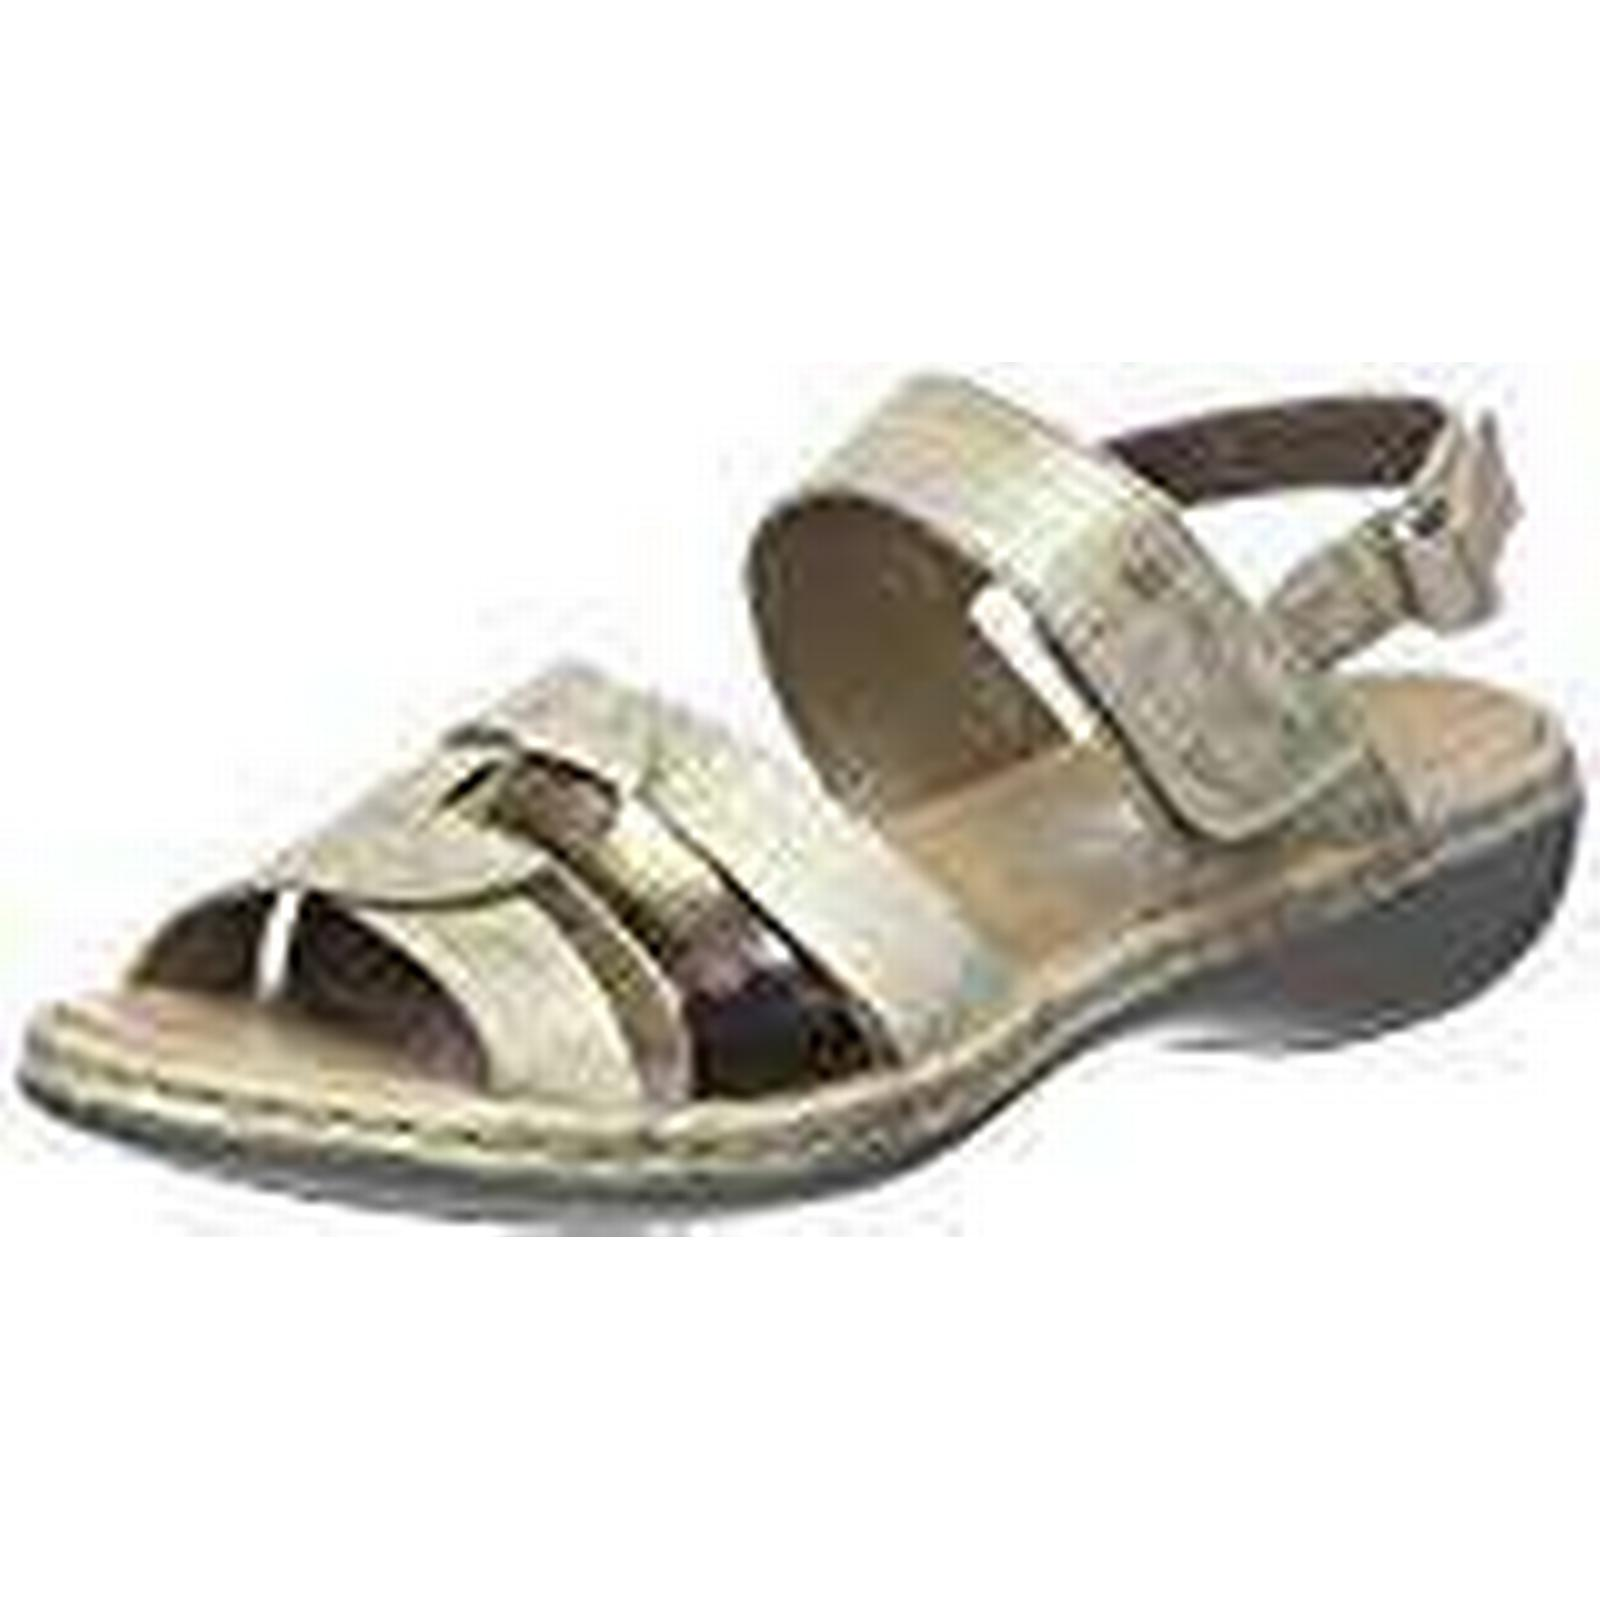 Rieker Women's 659L5-62 UK Open Toe Sandals, Beige (62), 4 UK 659L5-62 37 EU 20c2b6